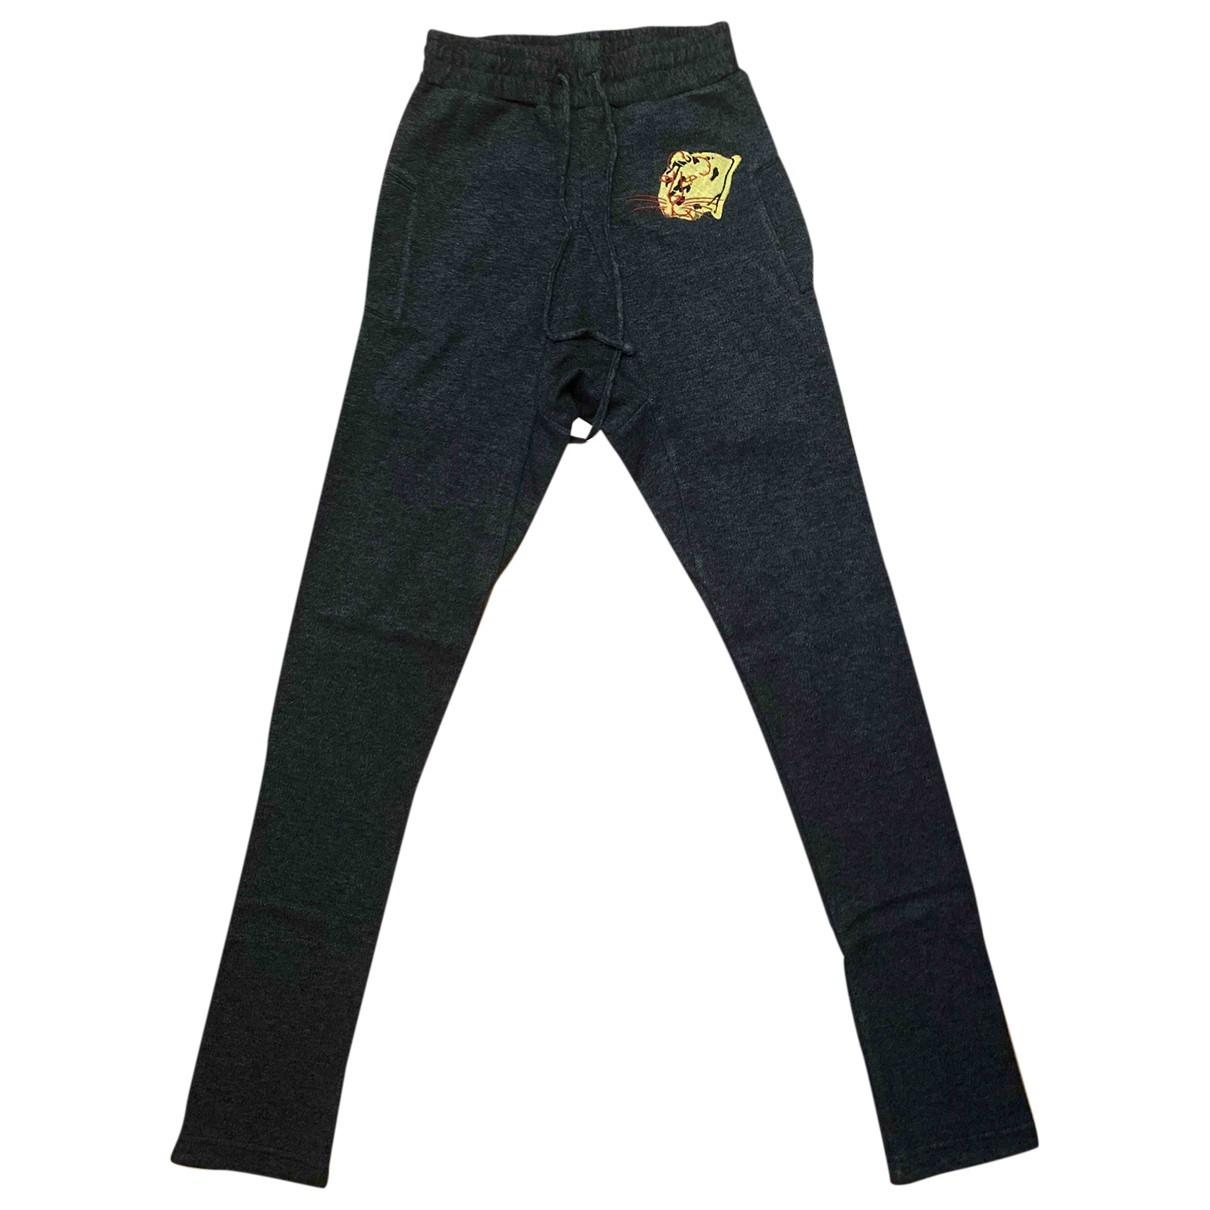 Pantalones en Algodon Antracita Vivienne Westwood